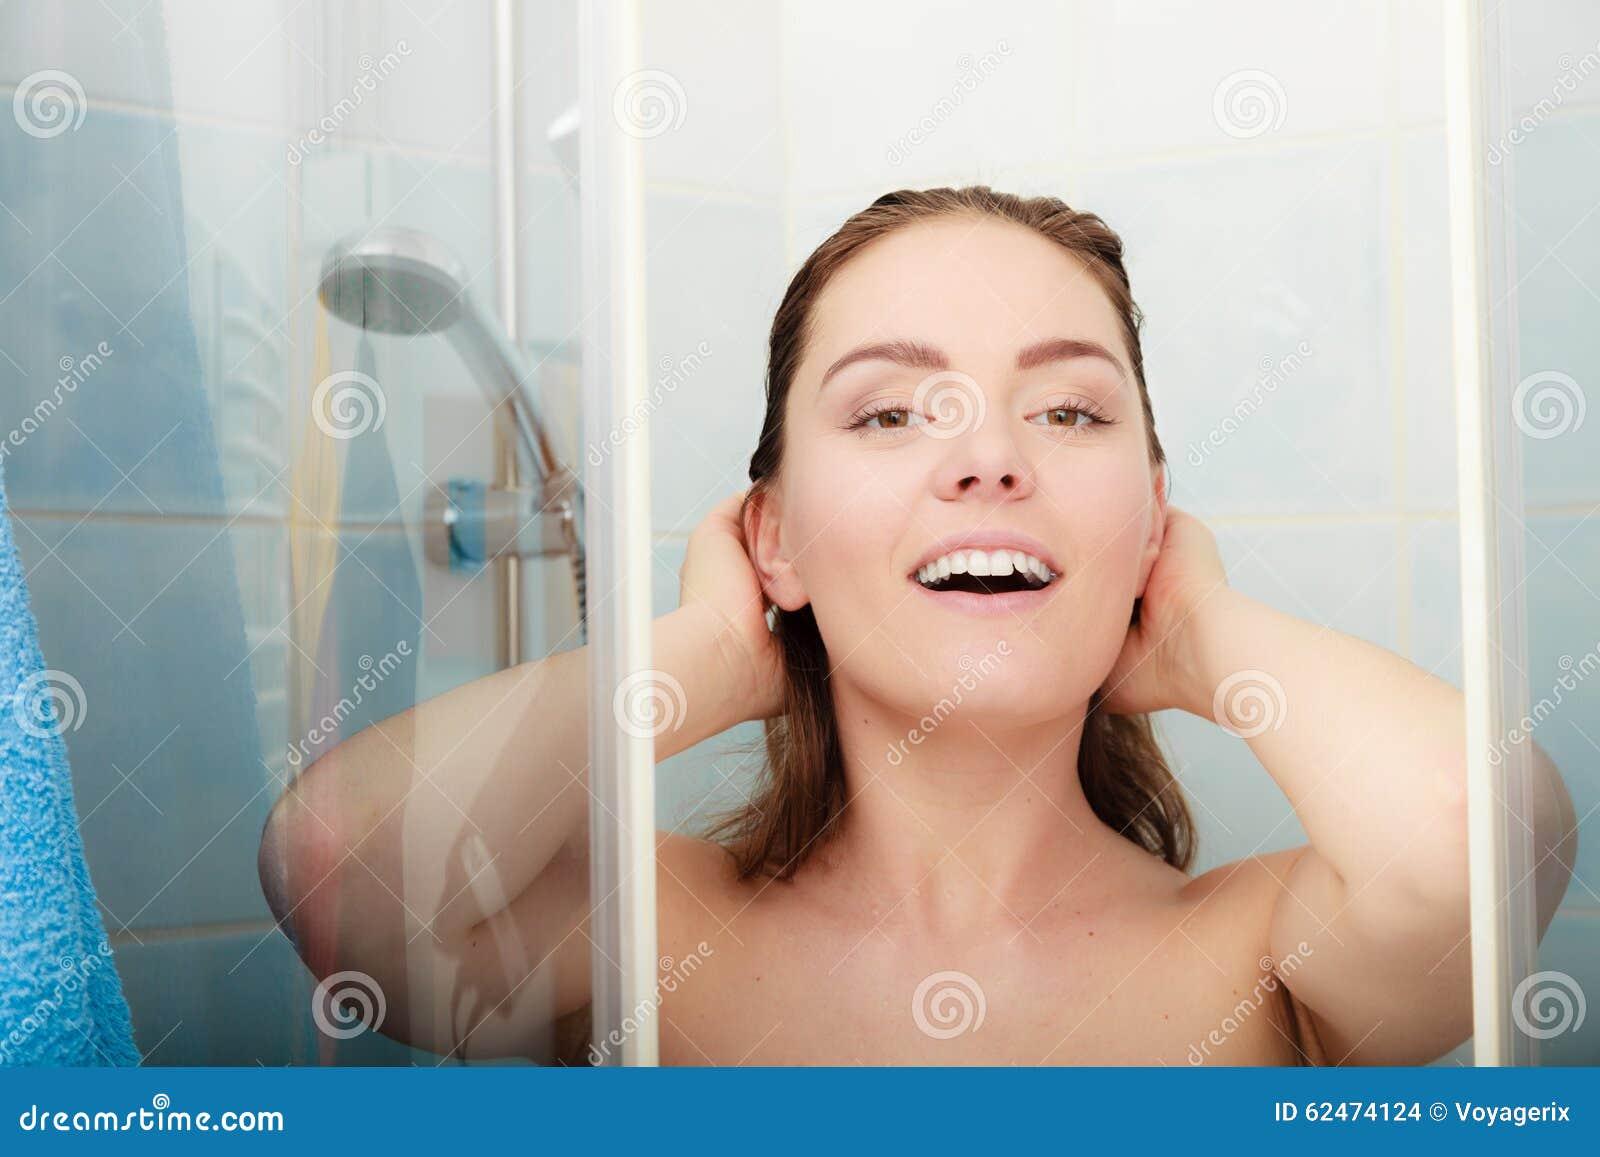 Kvinna som duschar i duschkabinsovalkov